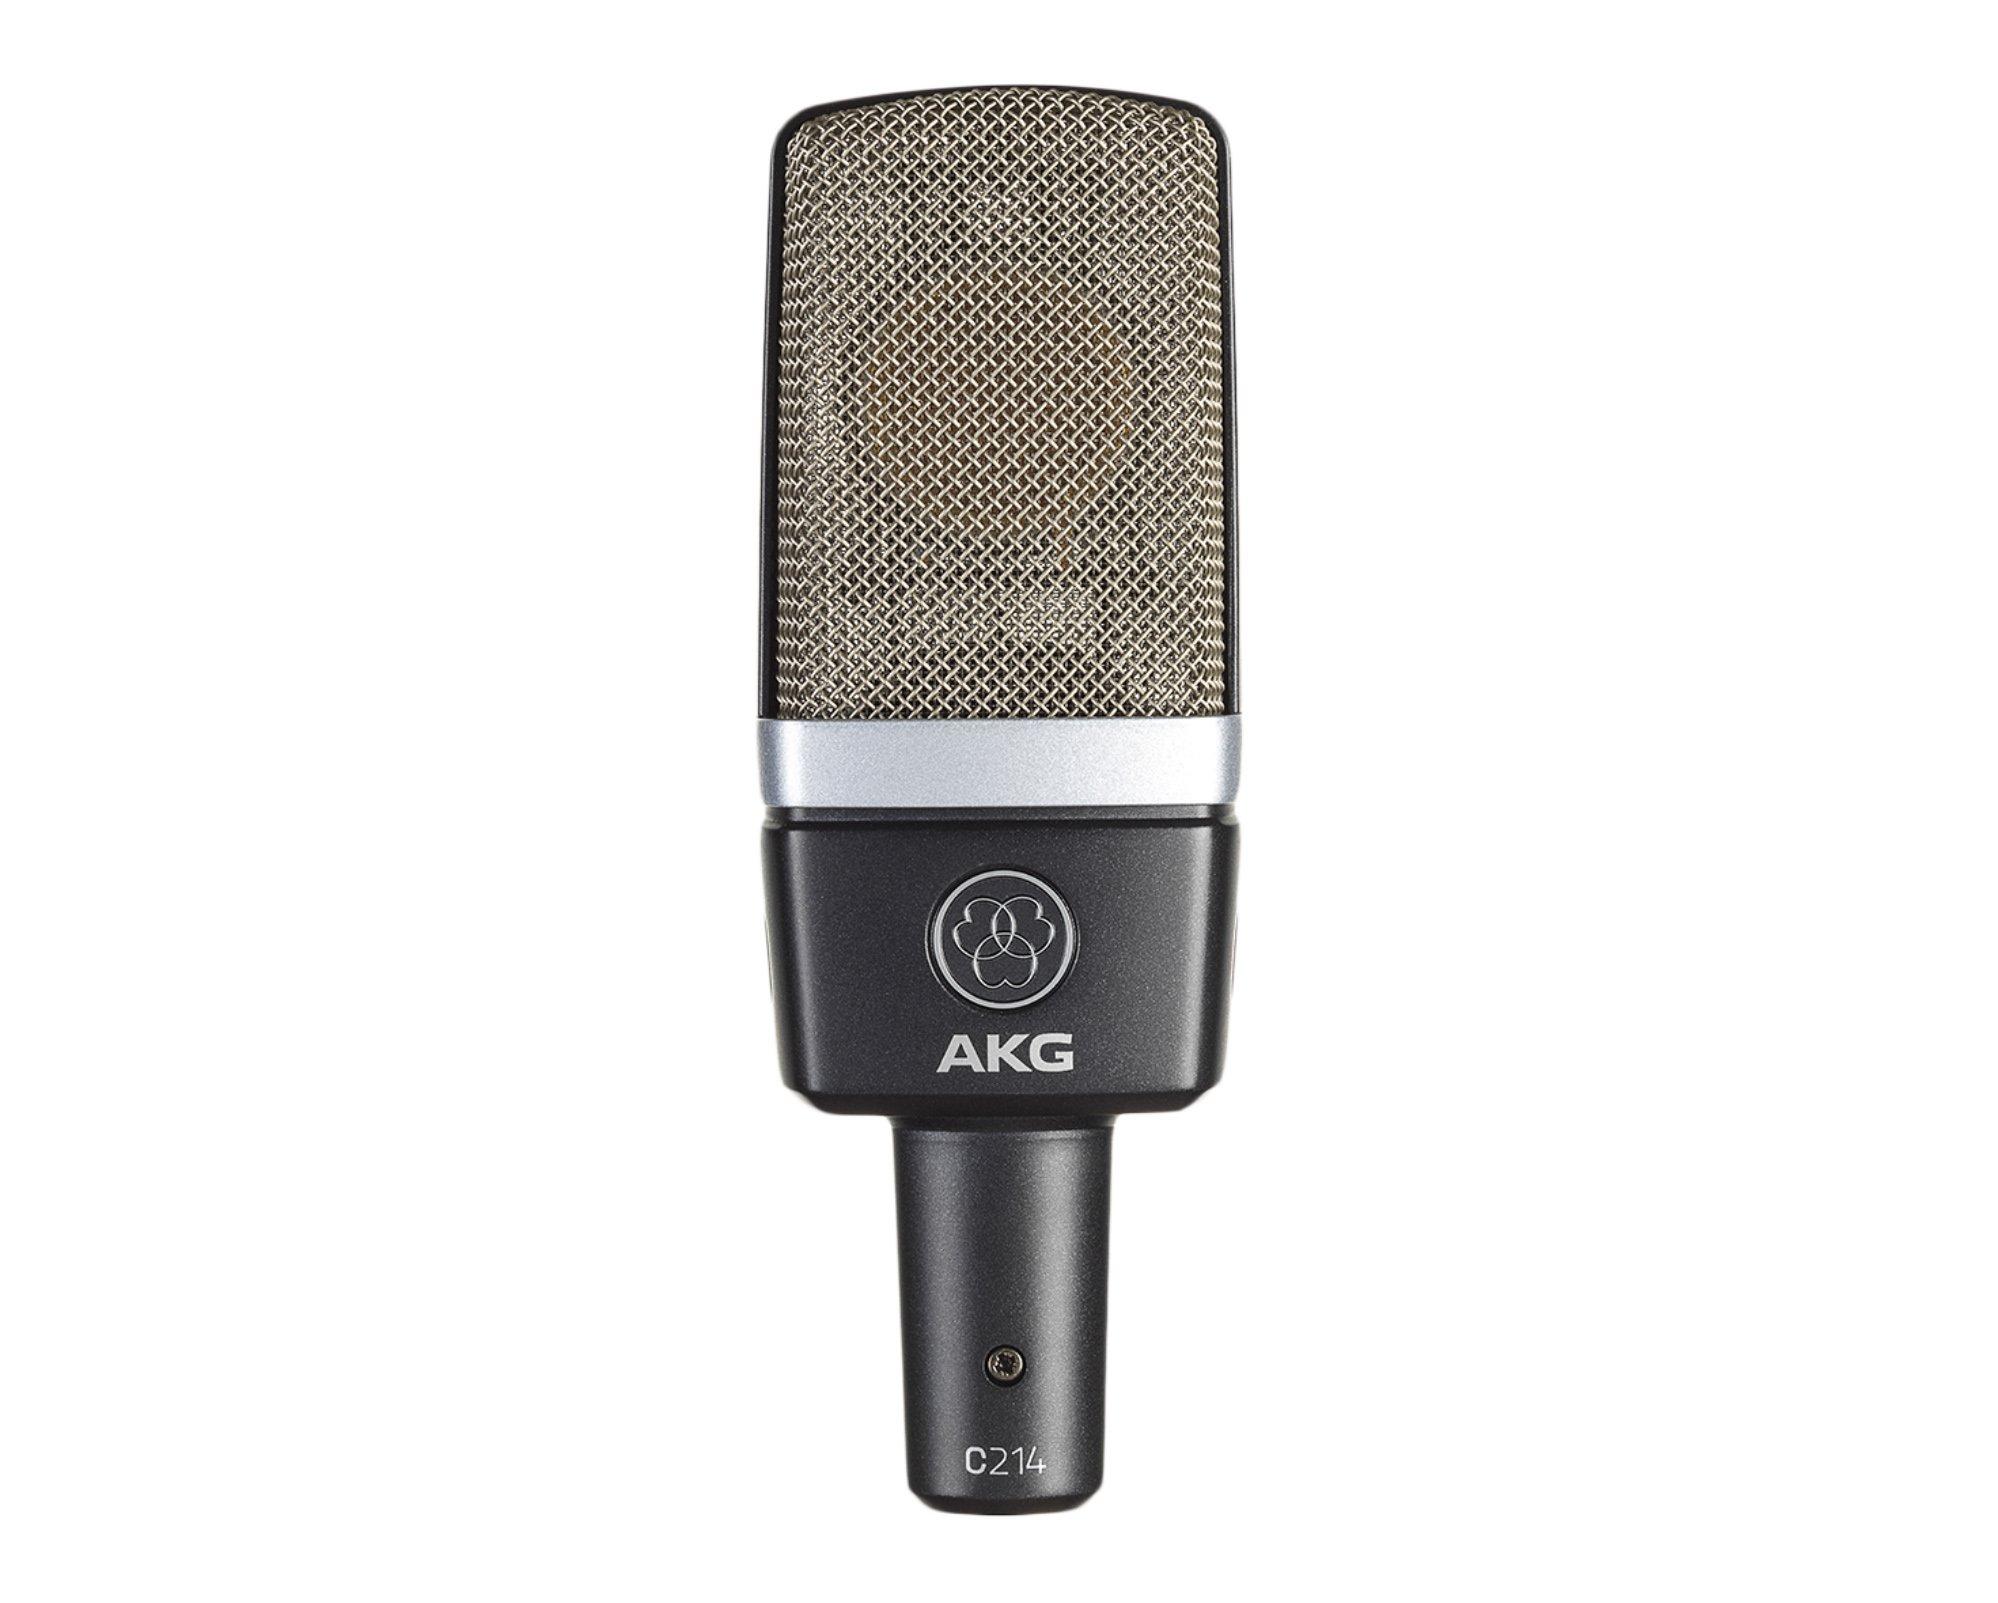 Large Diaphragm Cardioid Condenser Microphone